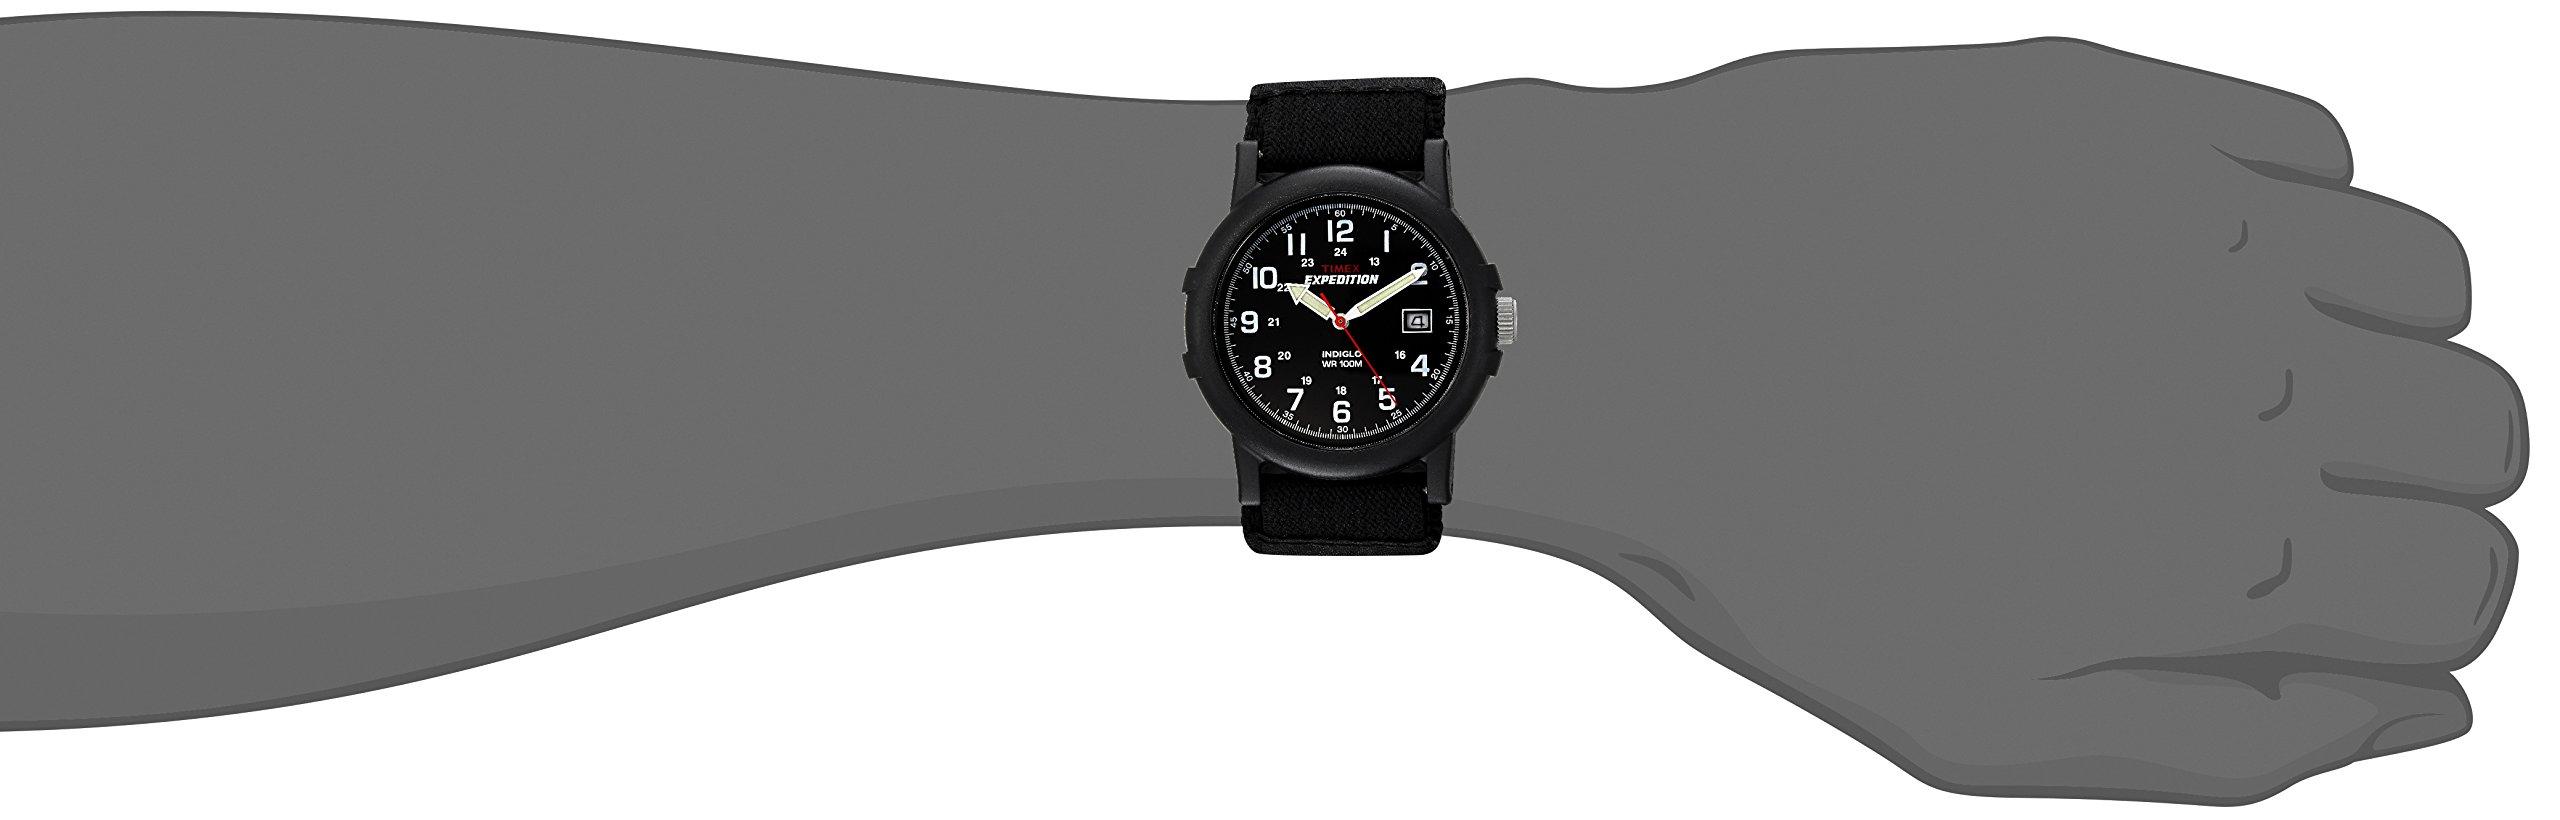 Timex Expedition – Reloj de Cuarzo Unisex, Correa Textil